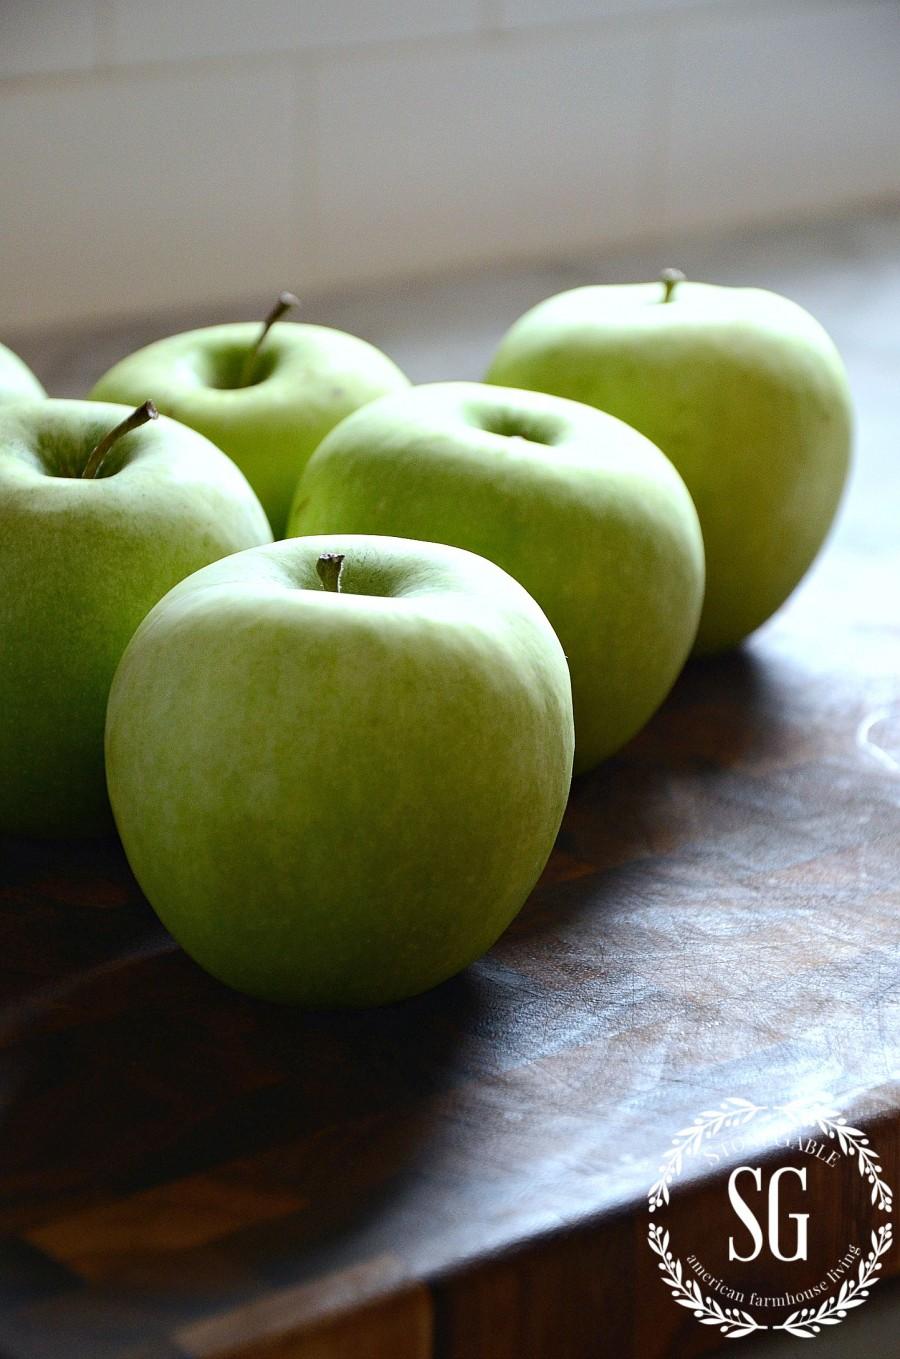 GREEN APPLE CENTERPIECE-apples-stonegableblog.com